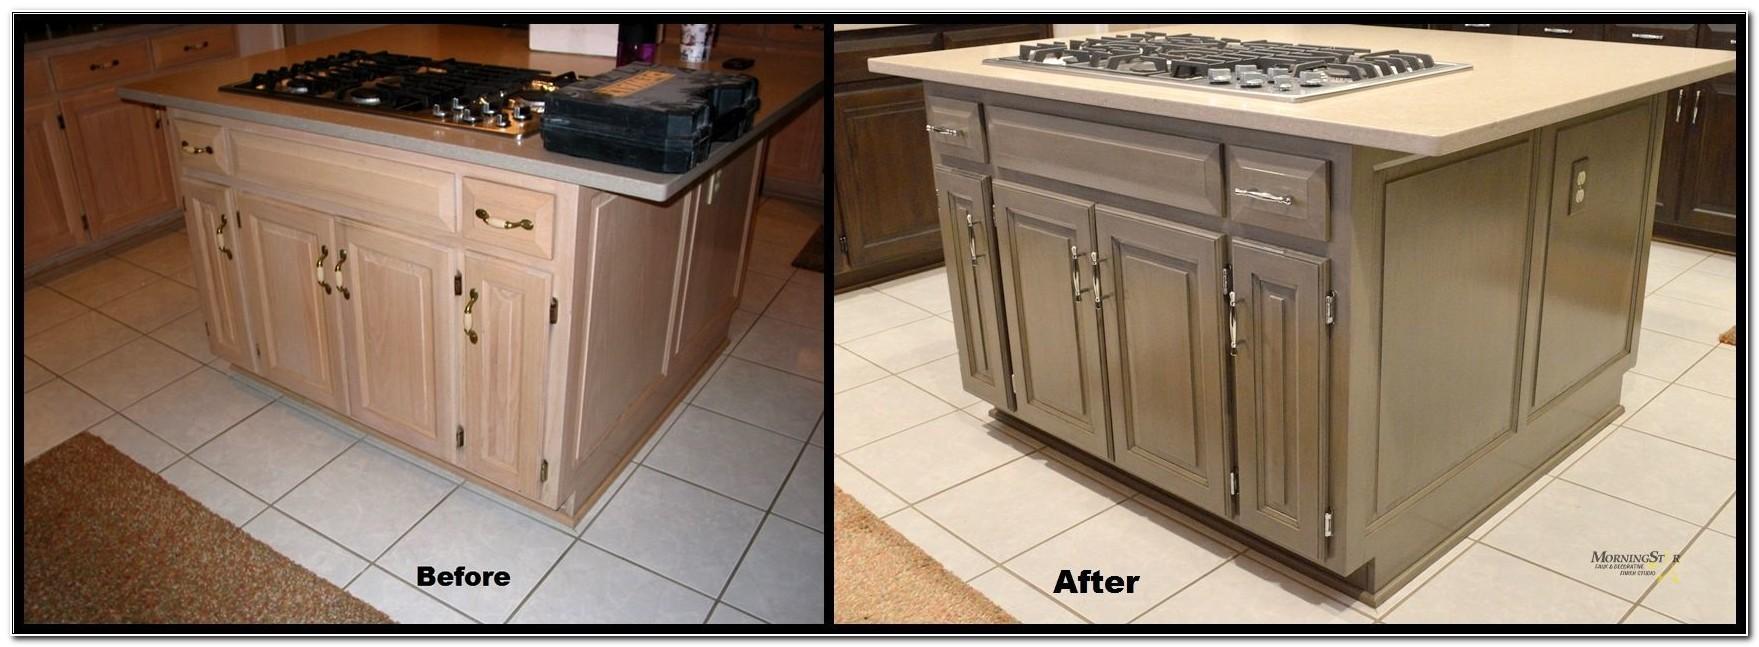 Refinishing Pickled Oak Kitchen Cabinets